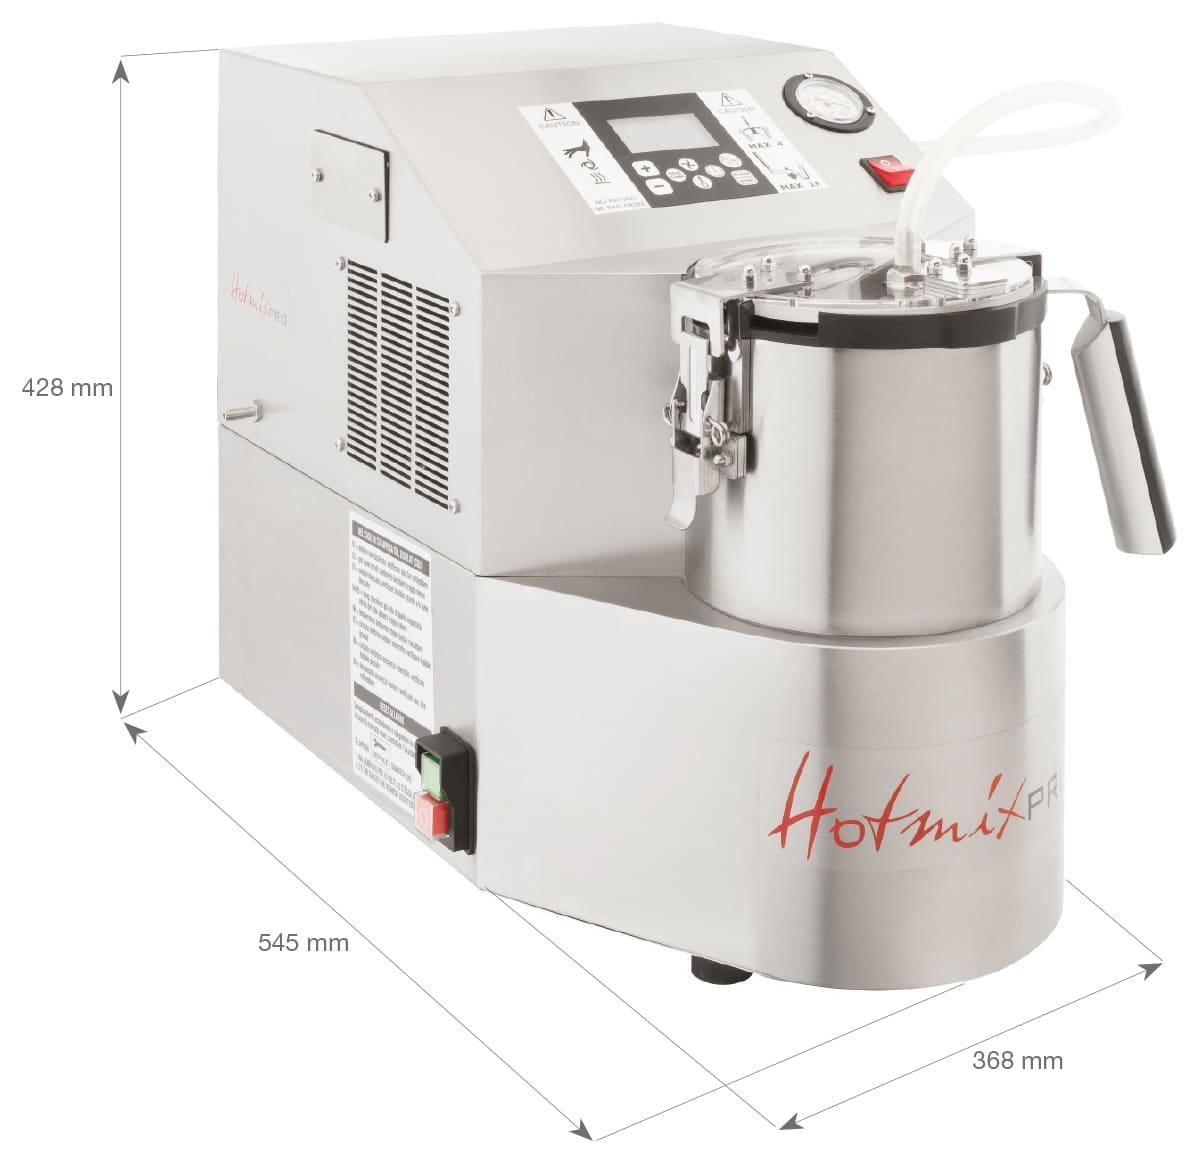 HotmixPro - Multifunktions Küchenmaschinen